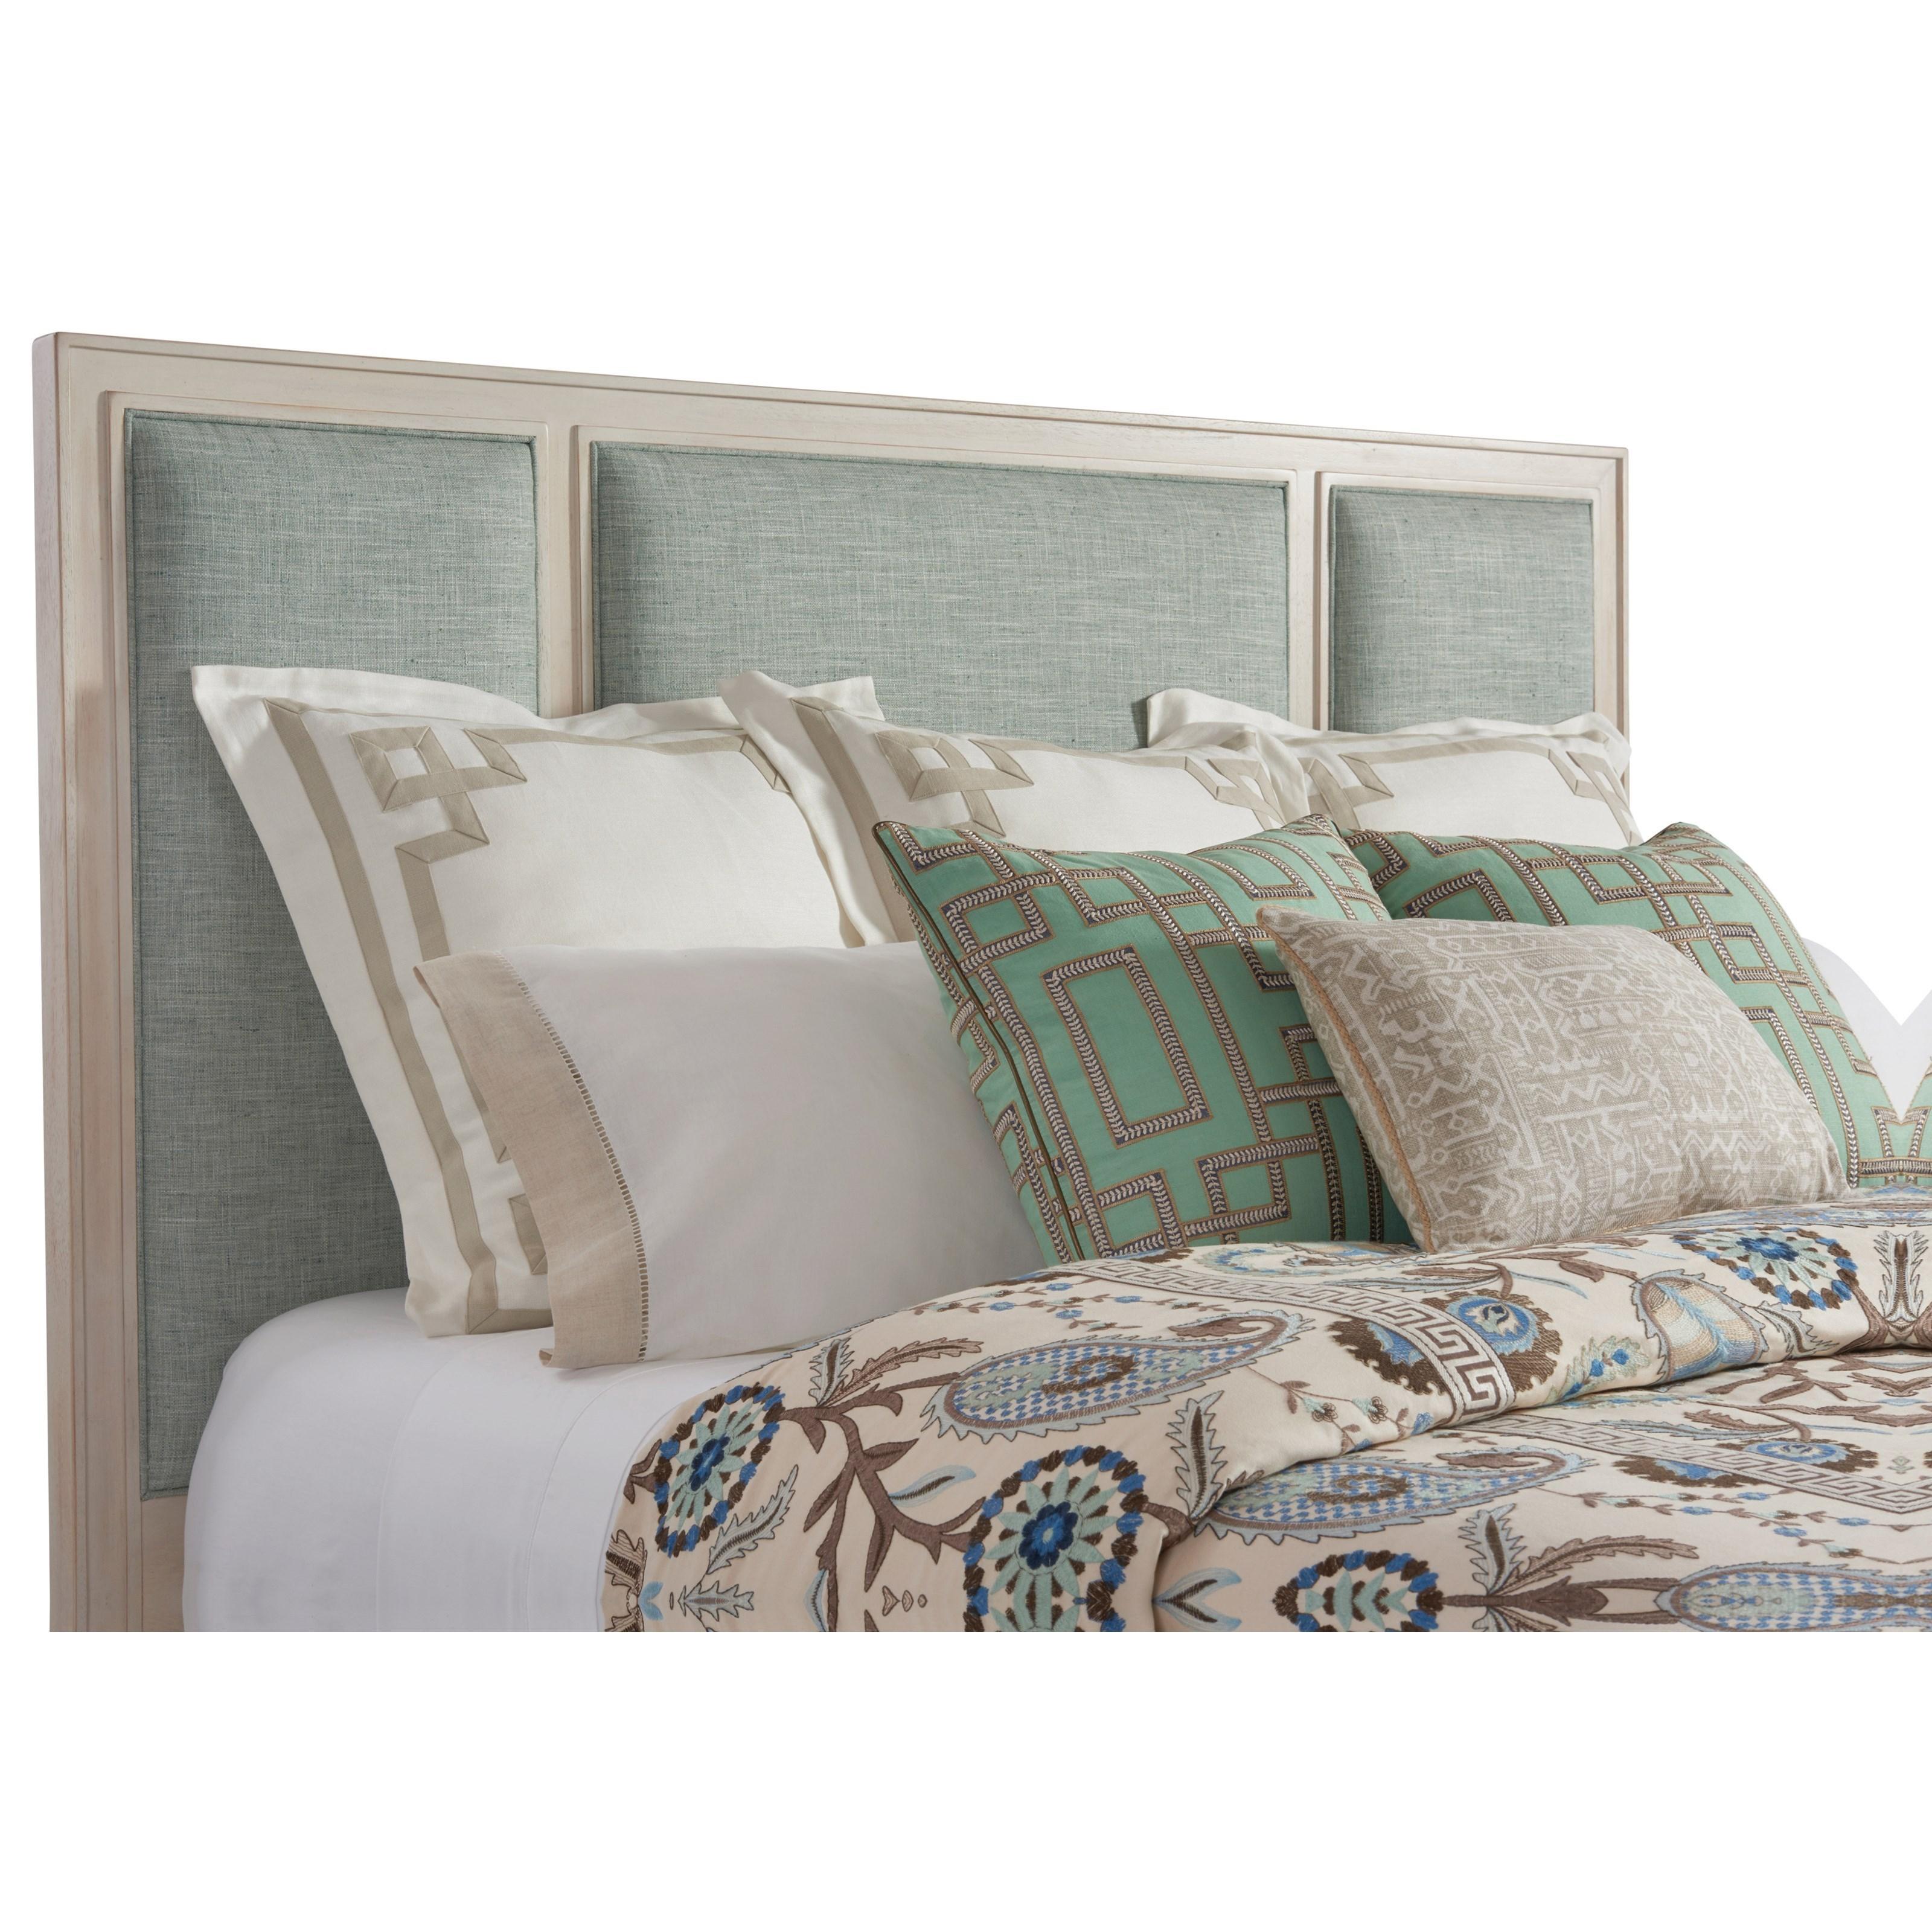 Newport Crystal Cove Custom Upholstered Hdbd 6/6 by Barclay Butera at Baer's Furniture